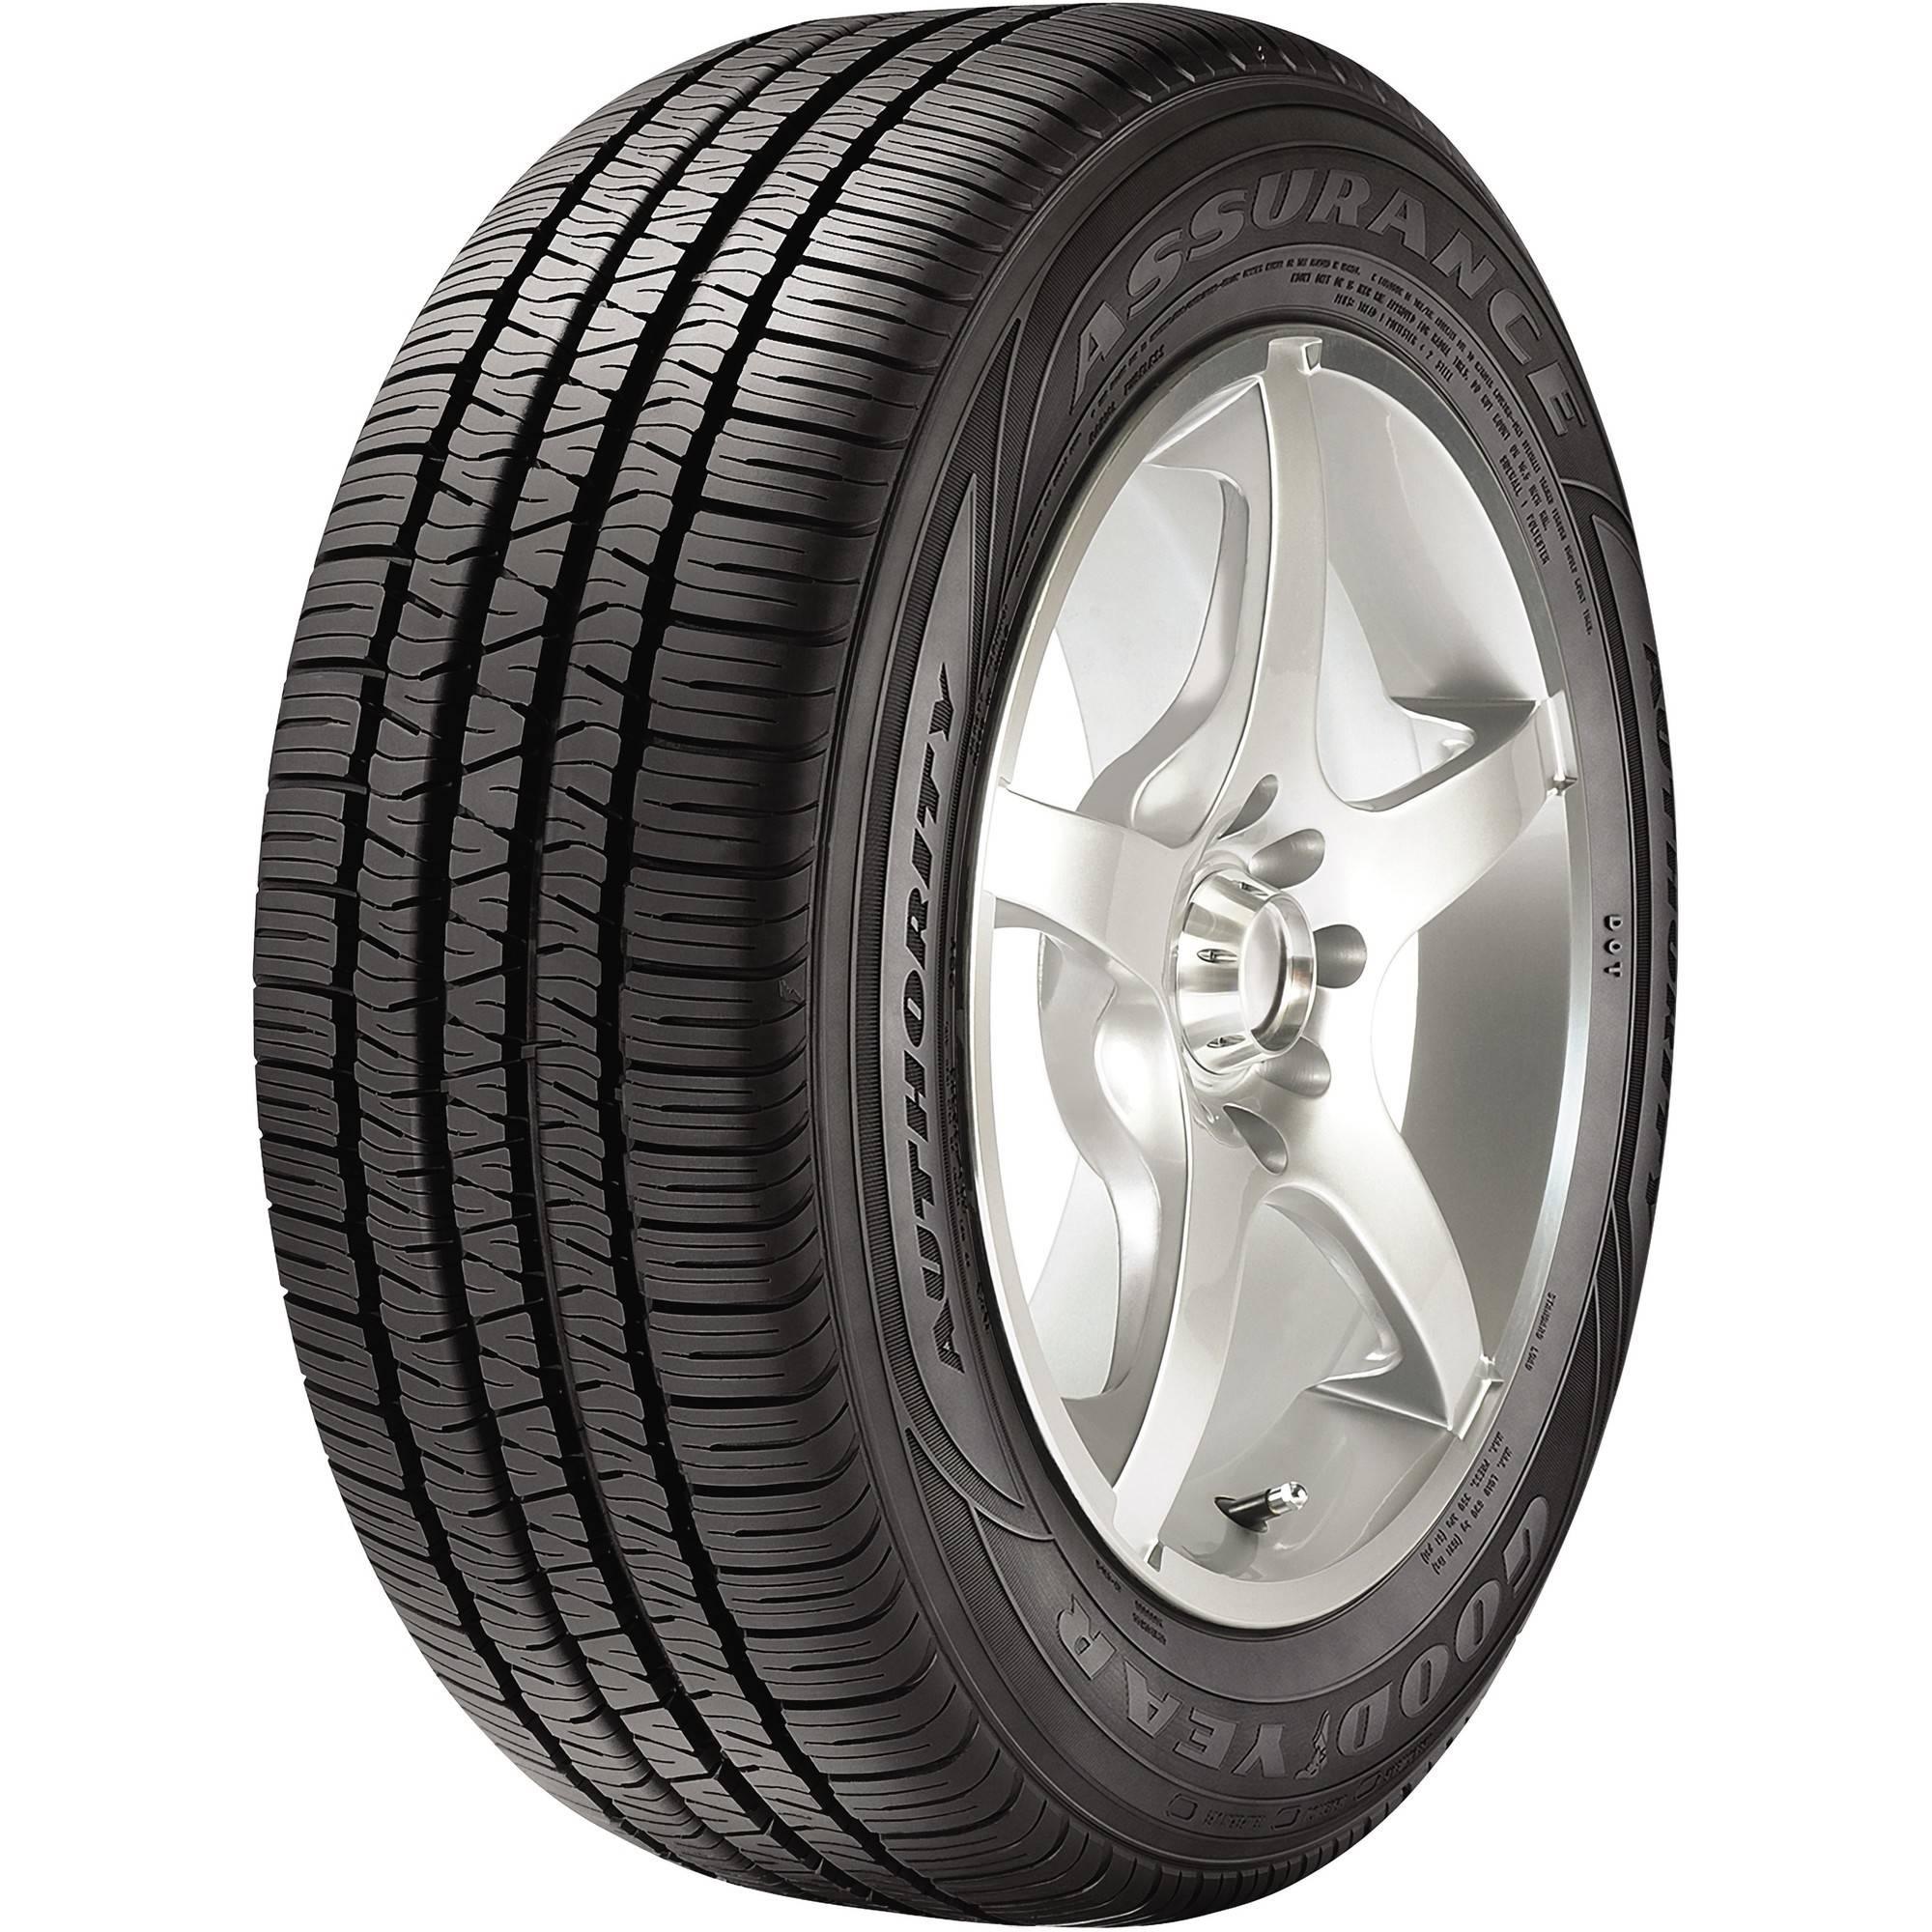 Goodyear Assurance Authority Tire 235/60R16  100H